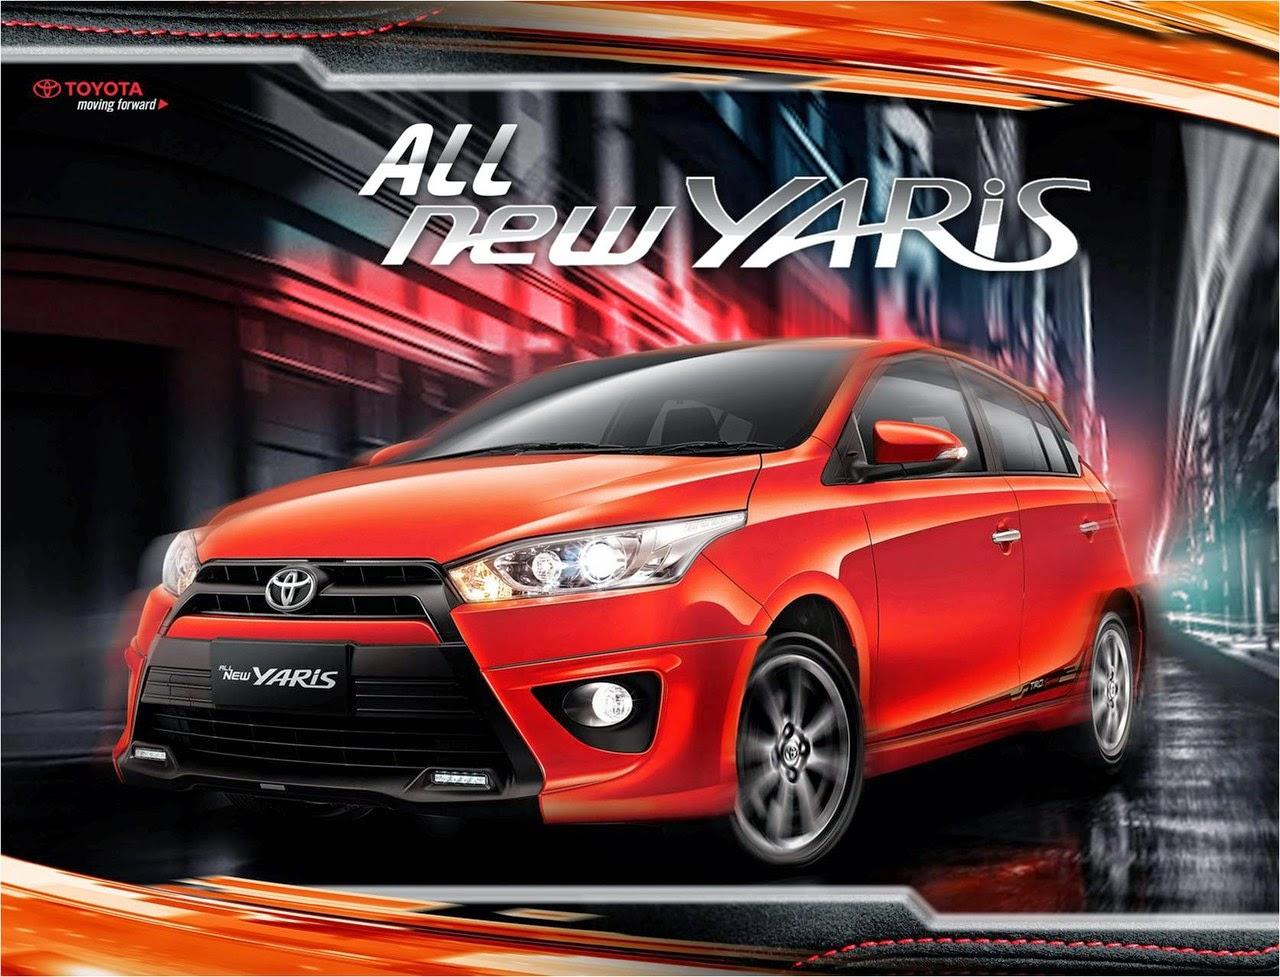 toyota yaris trd merah grand new avanza vs veloz hot promo all januari 2016 promosi